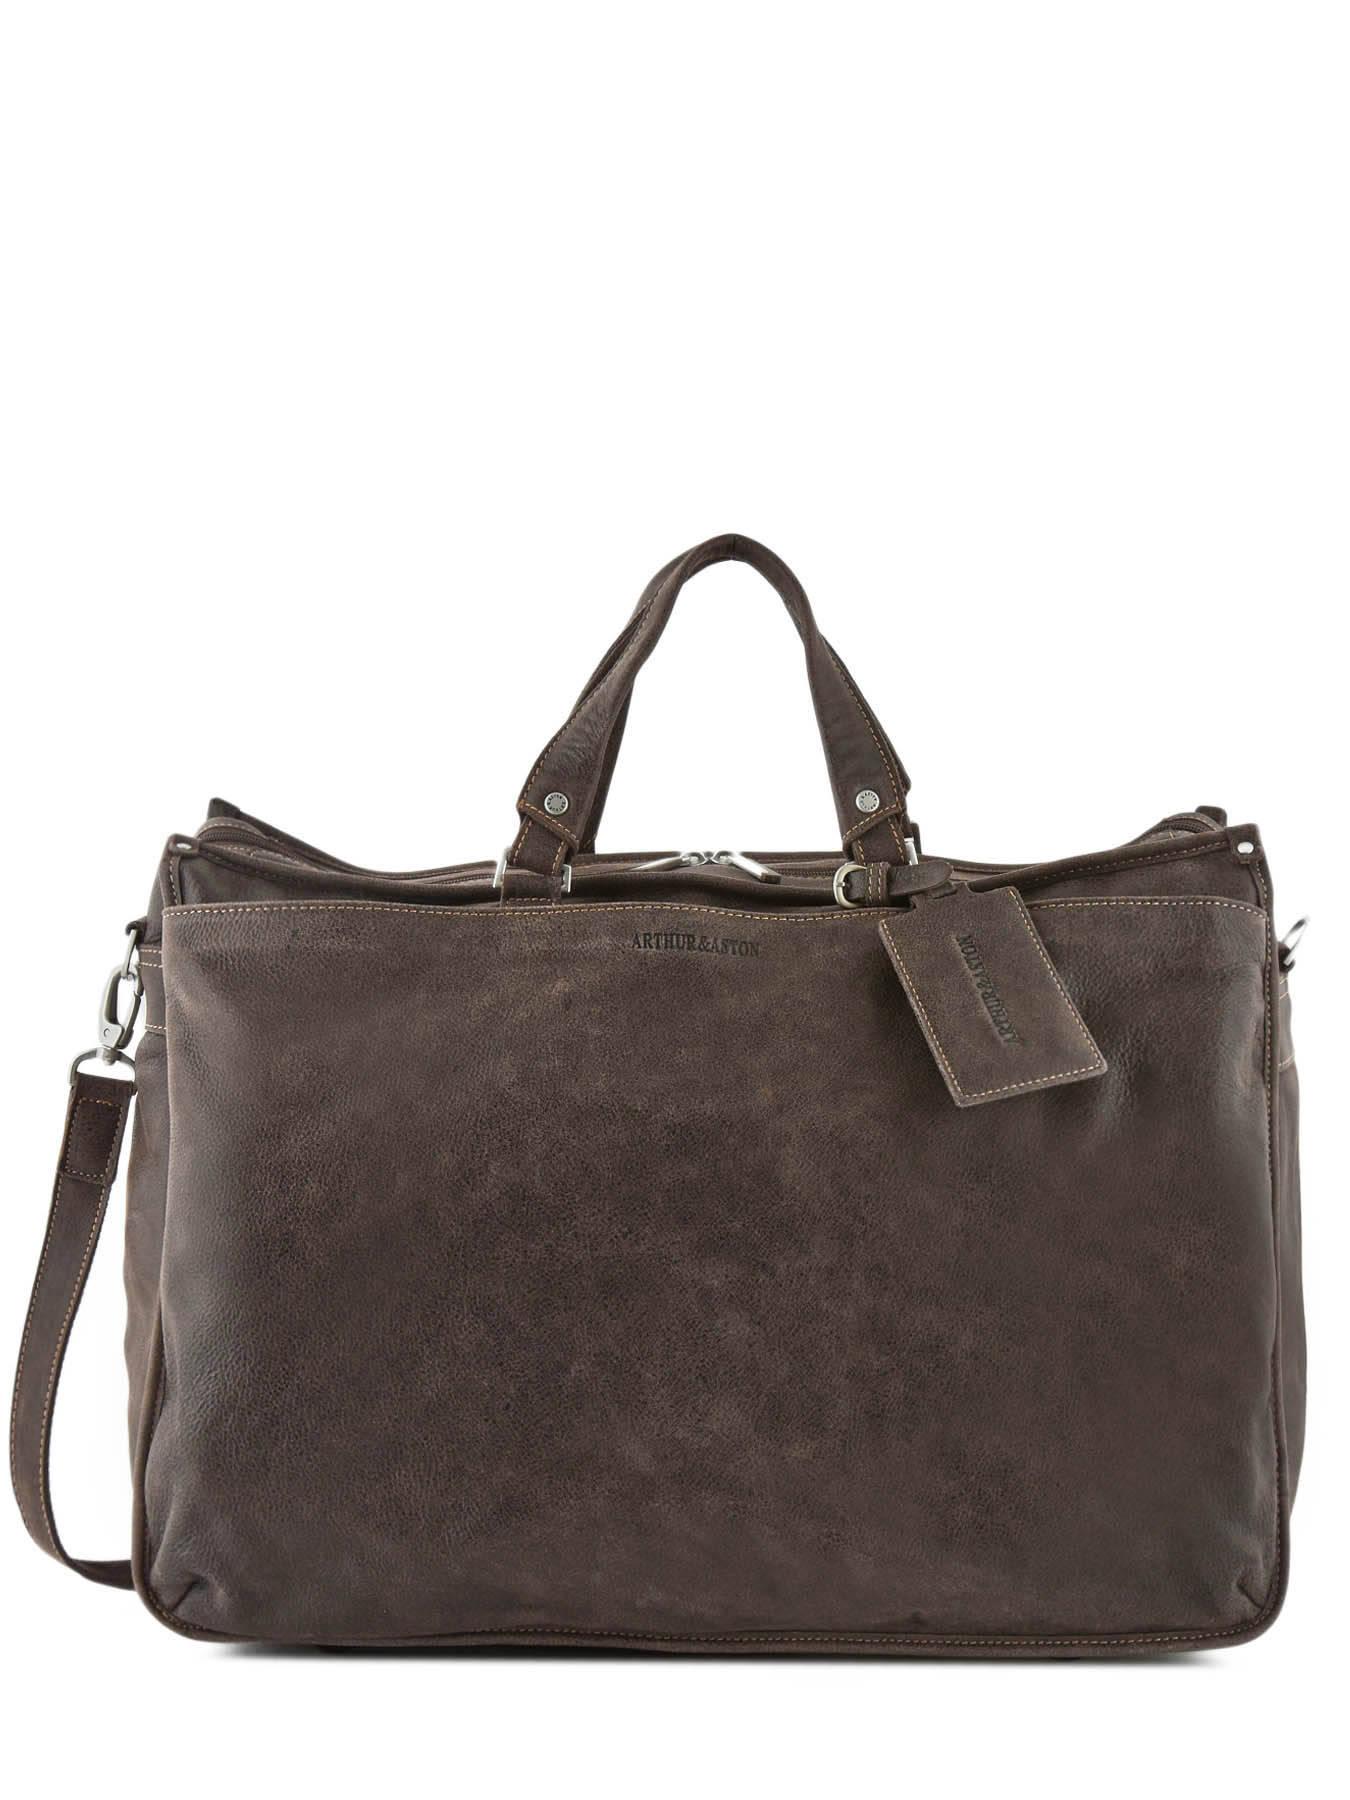 half price save up to 80% quality design Sac de voyage Destroy cuir ARTHUR ET ASTON